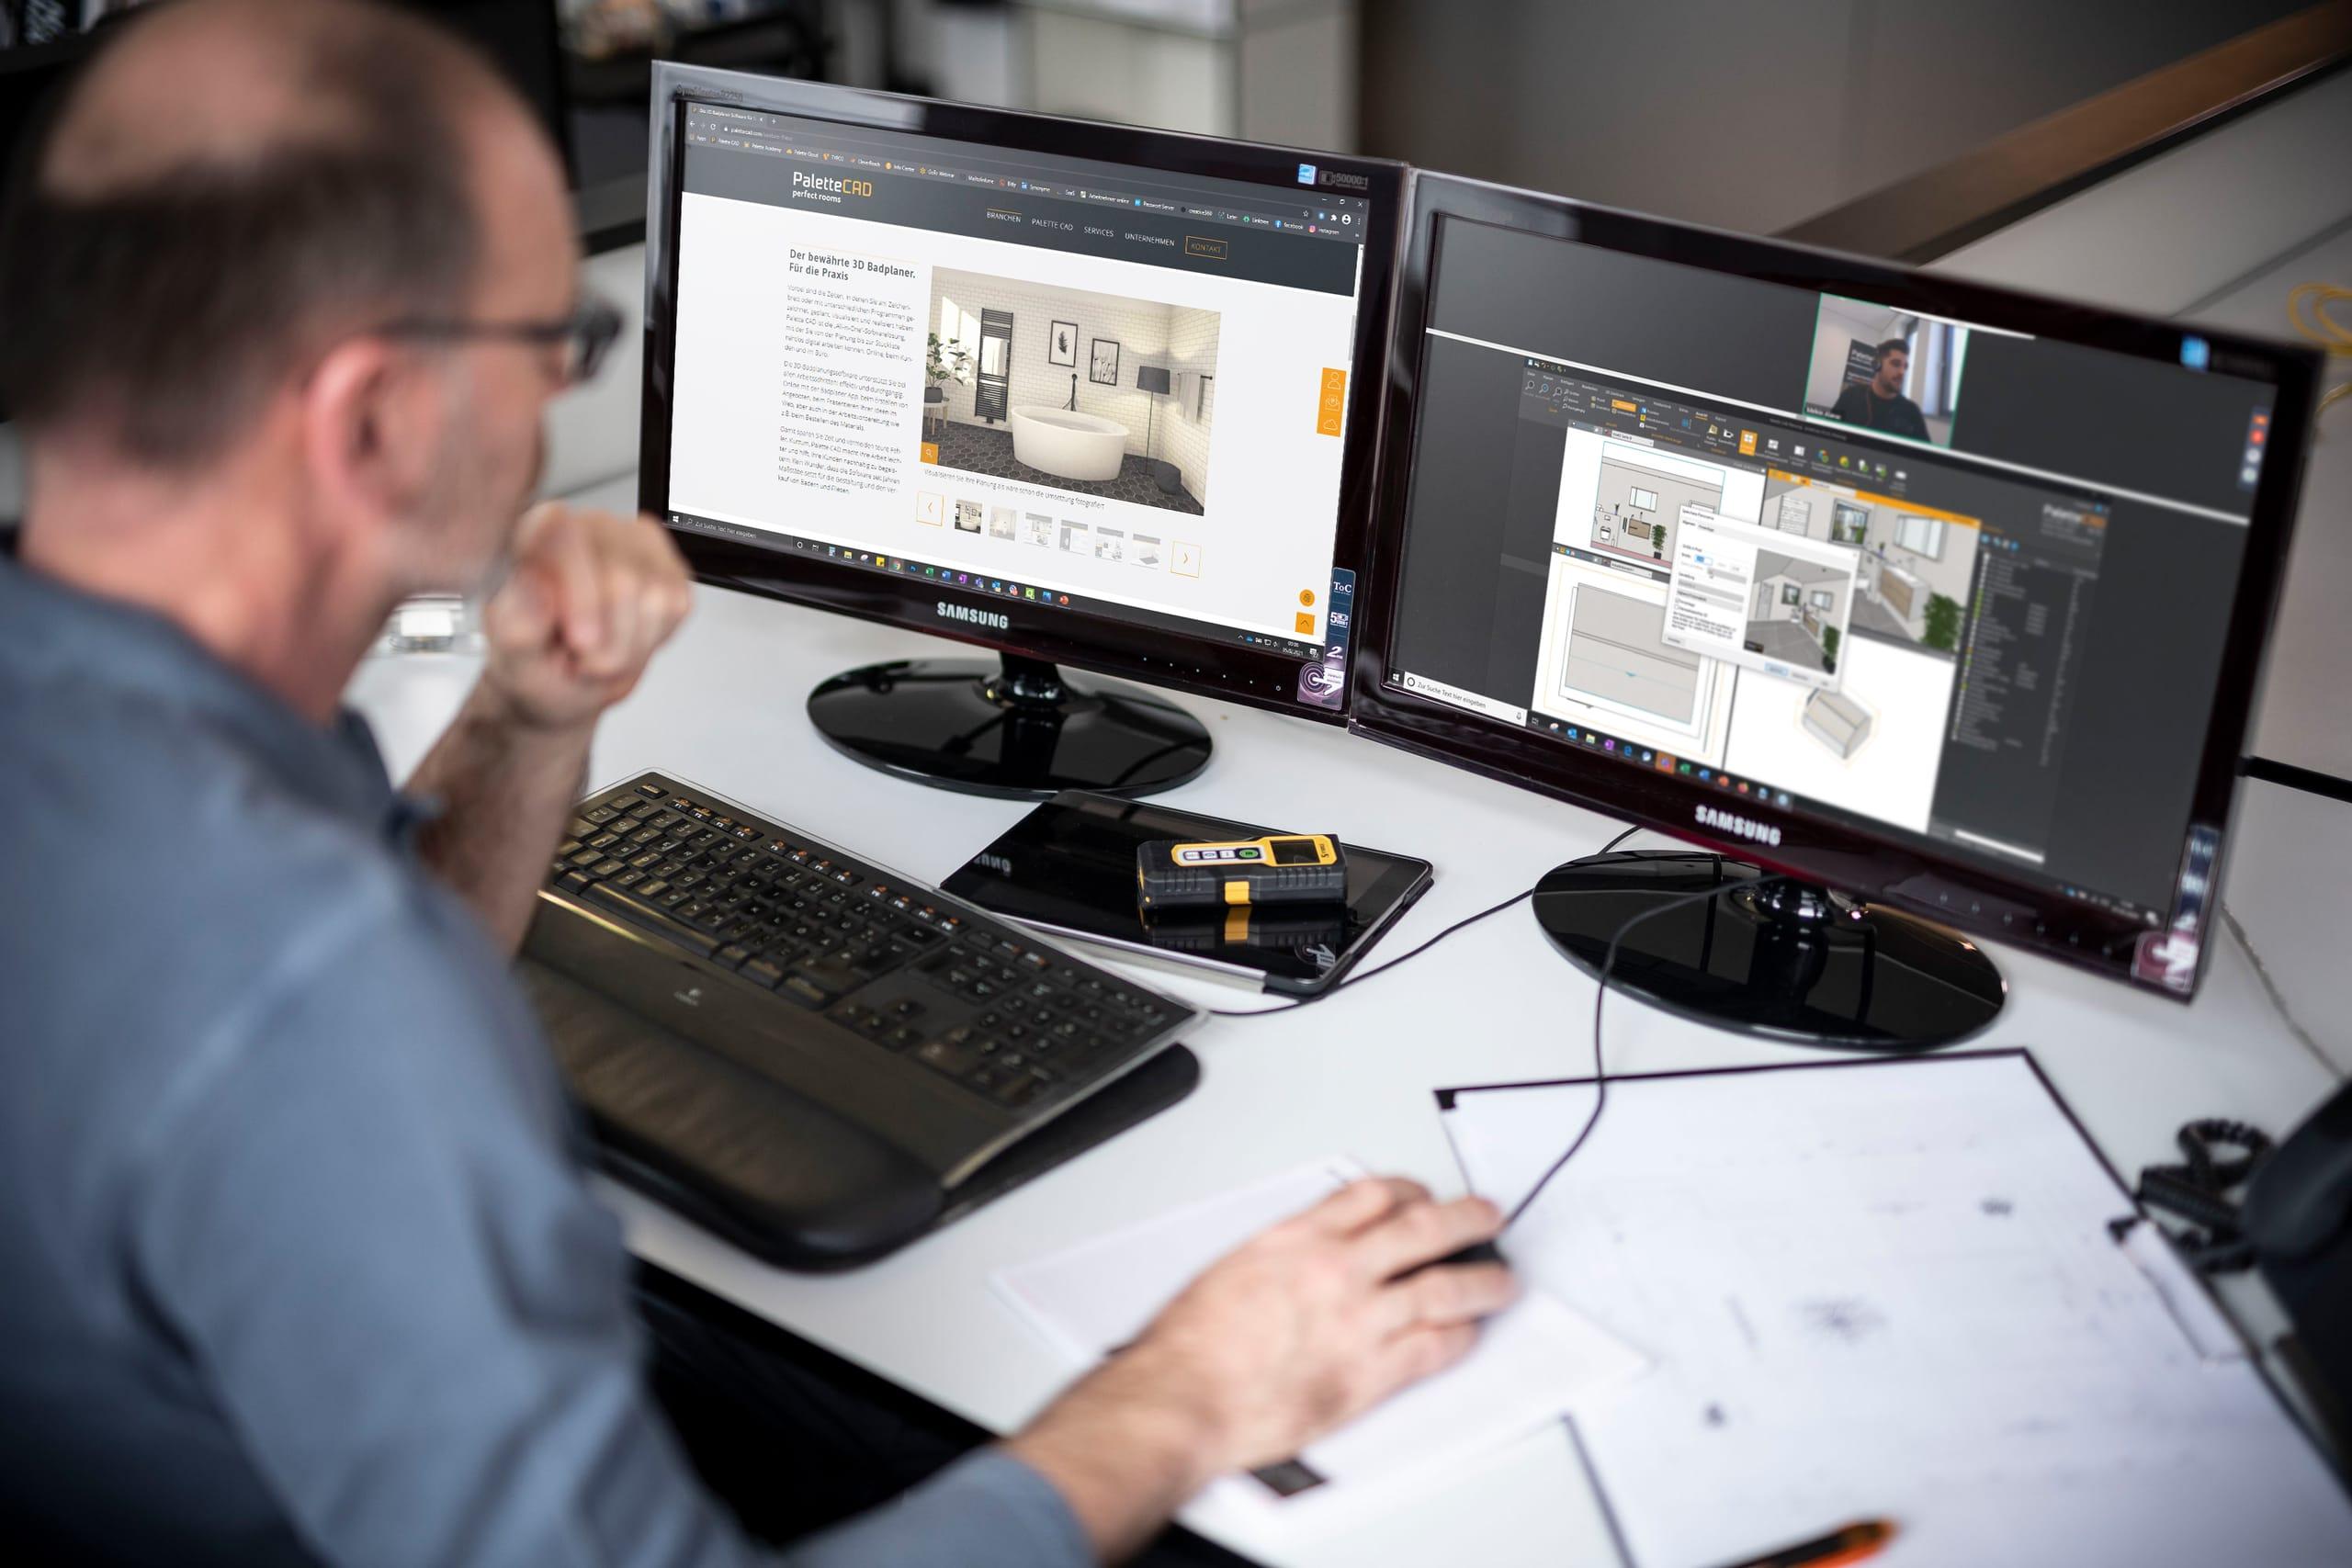 Palette CAD Terminankündigung: Sanitär-Webinar mit Expertentalk